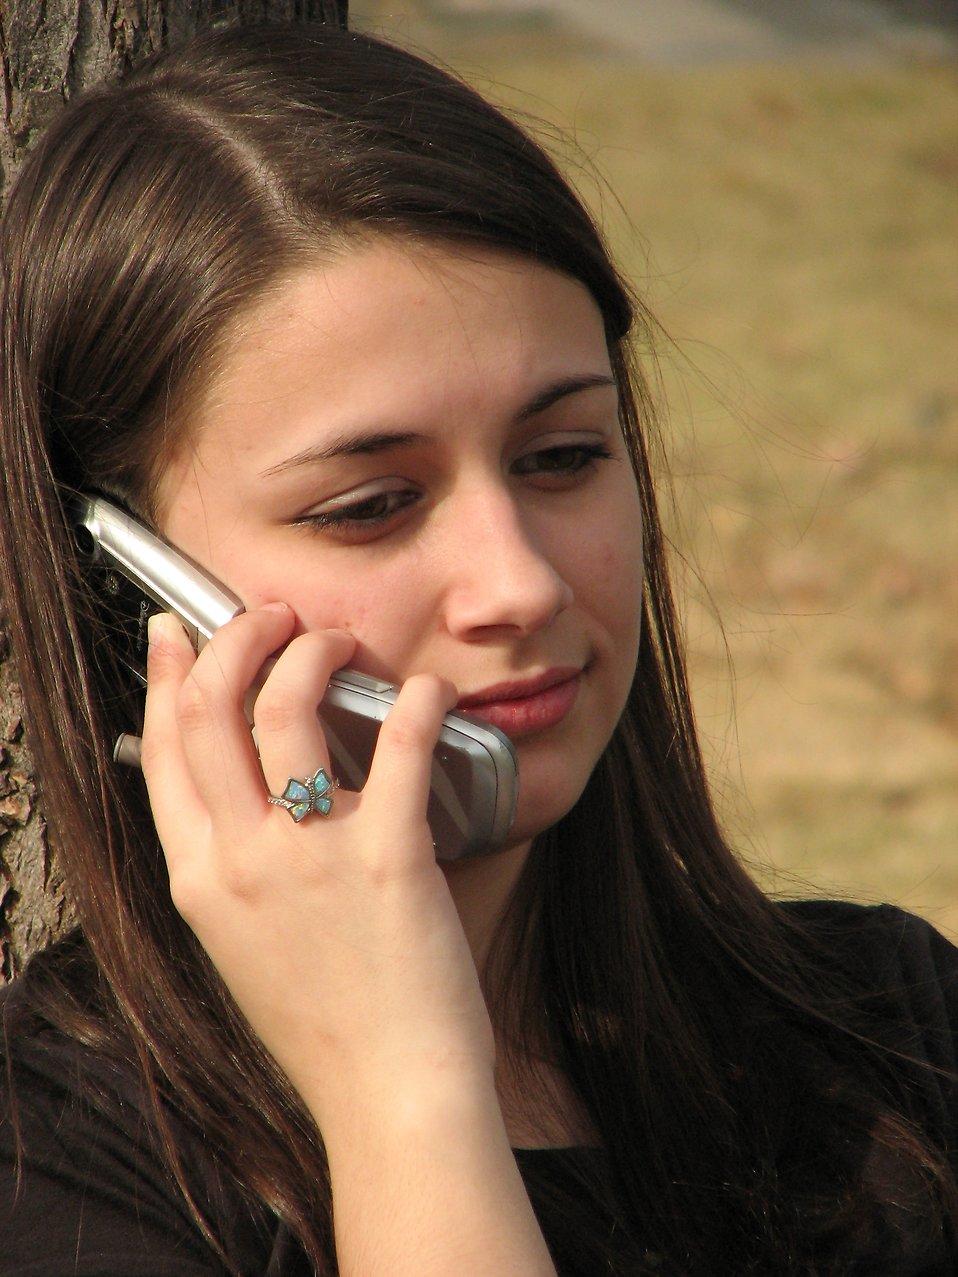 Cell Phone Girl   Free Stock Photo   Teenage girl talking